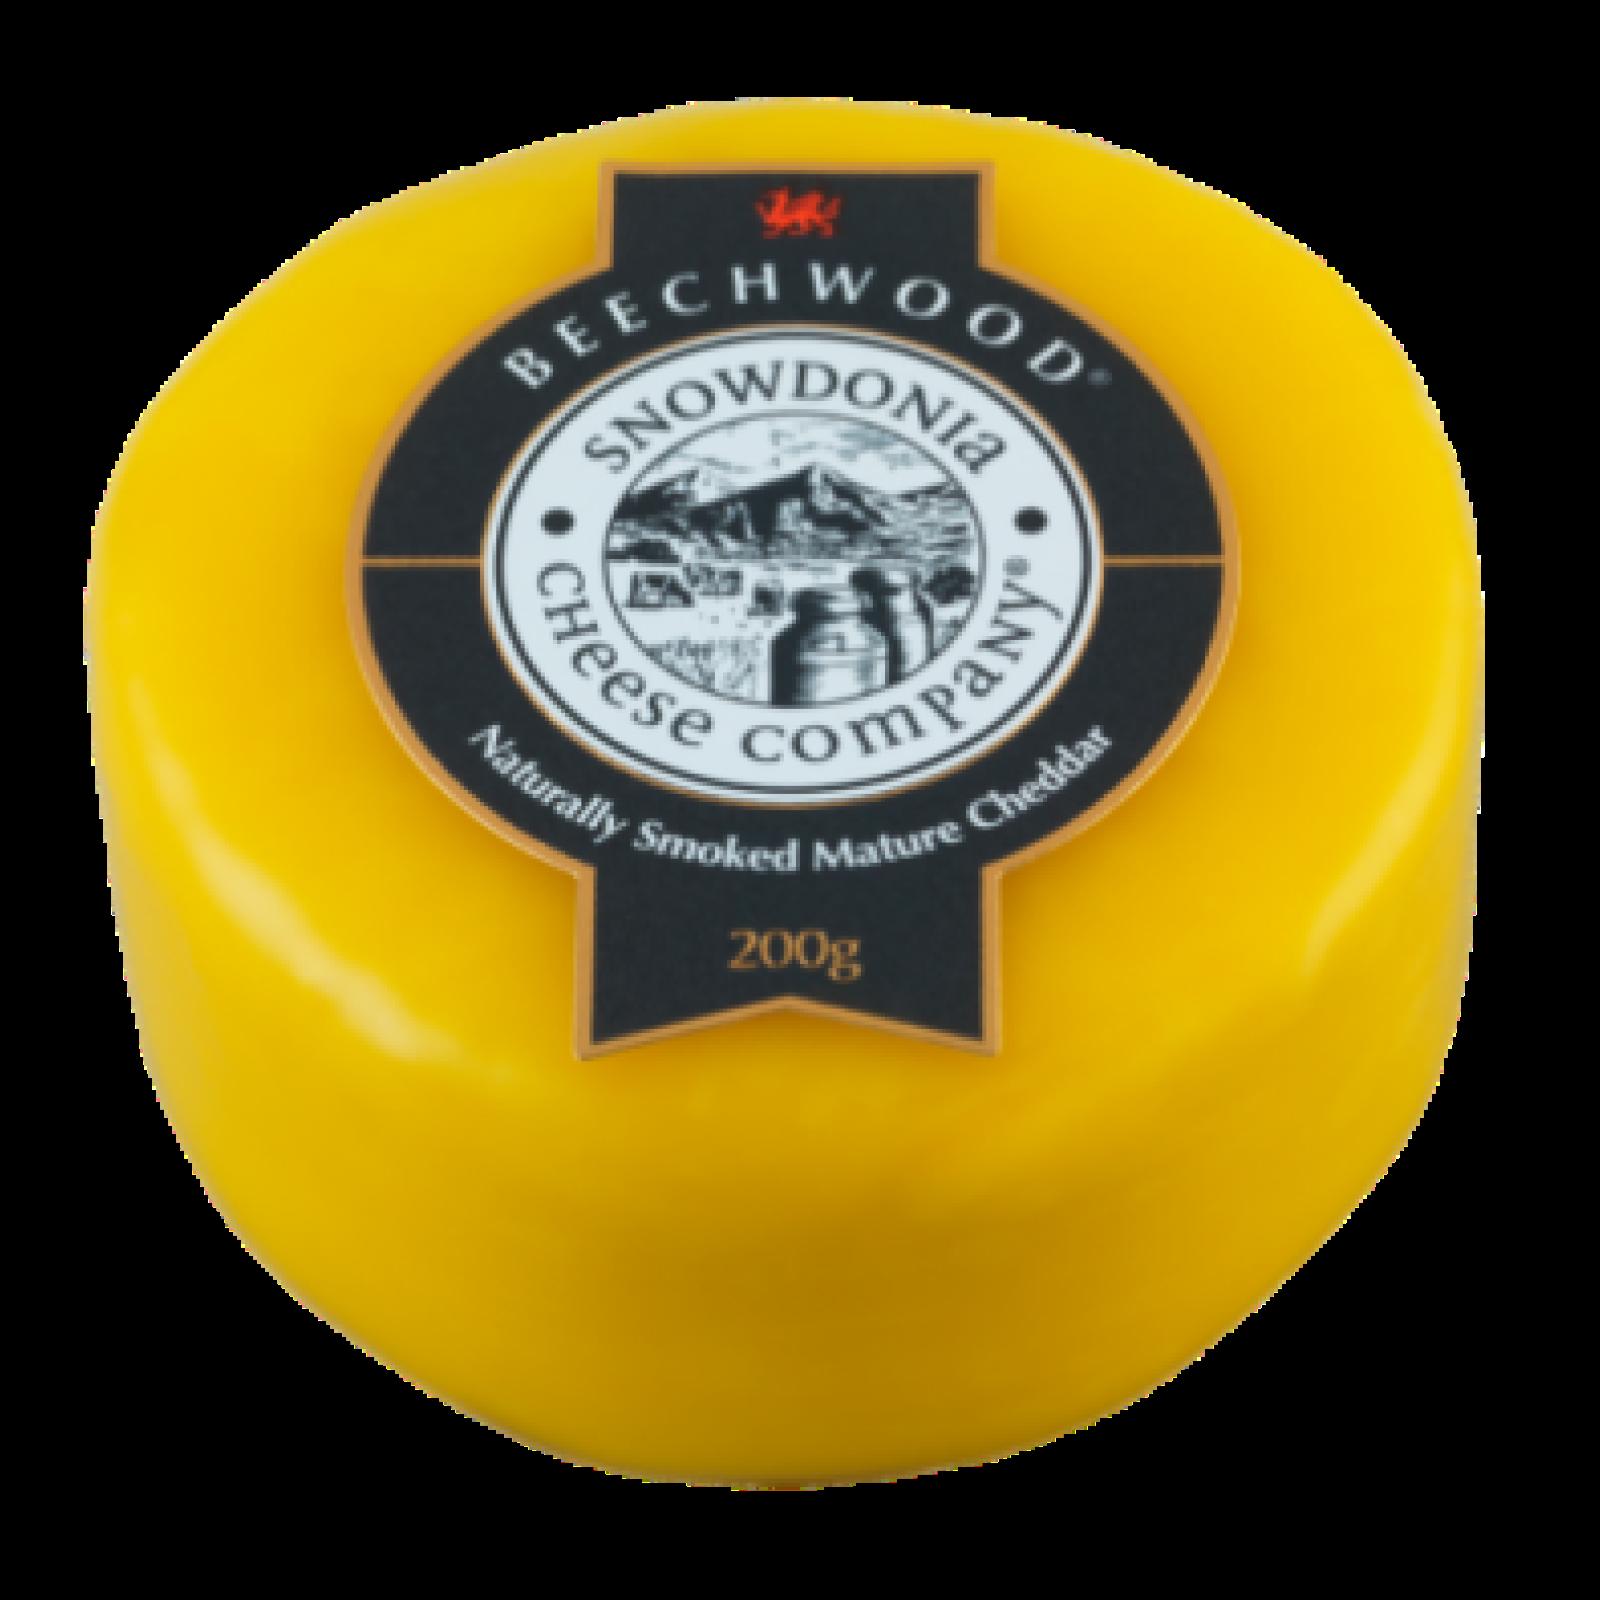 Beechwood 200g - Smoked Mature Cheddar Snowdonia Cheese Co